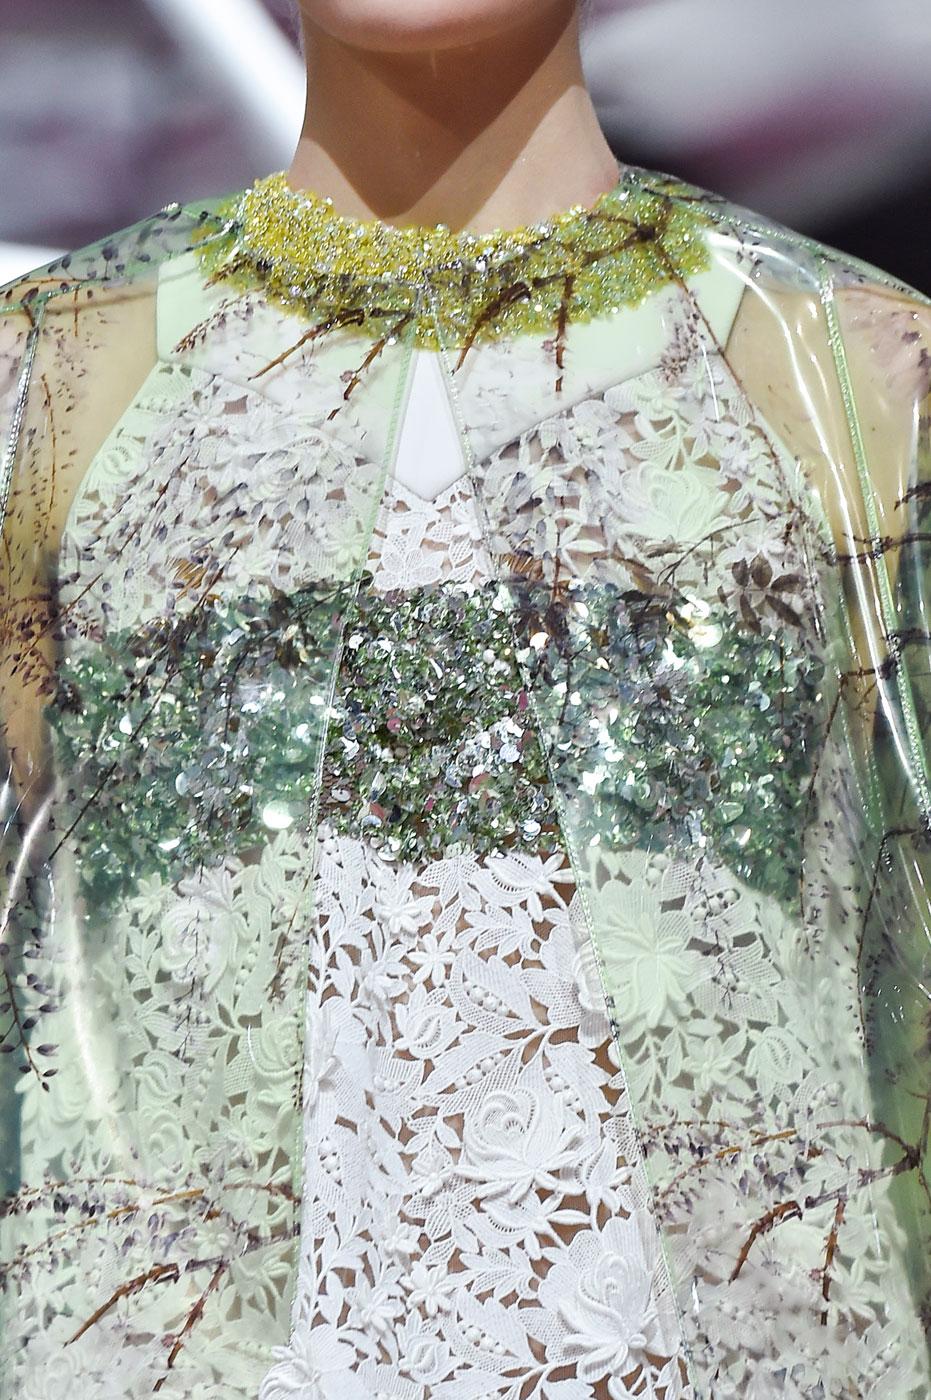 Christian-Dior-fashion-runway-show-close-ups-haute-couture-paris-spring-summer-2015-the-impression-001